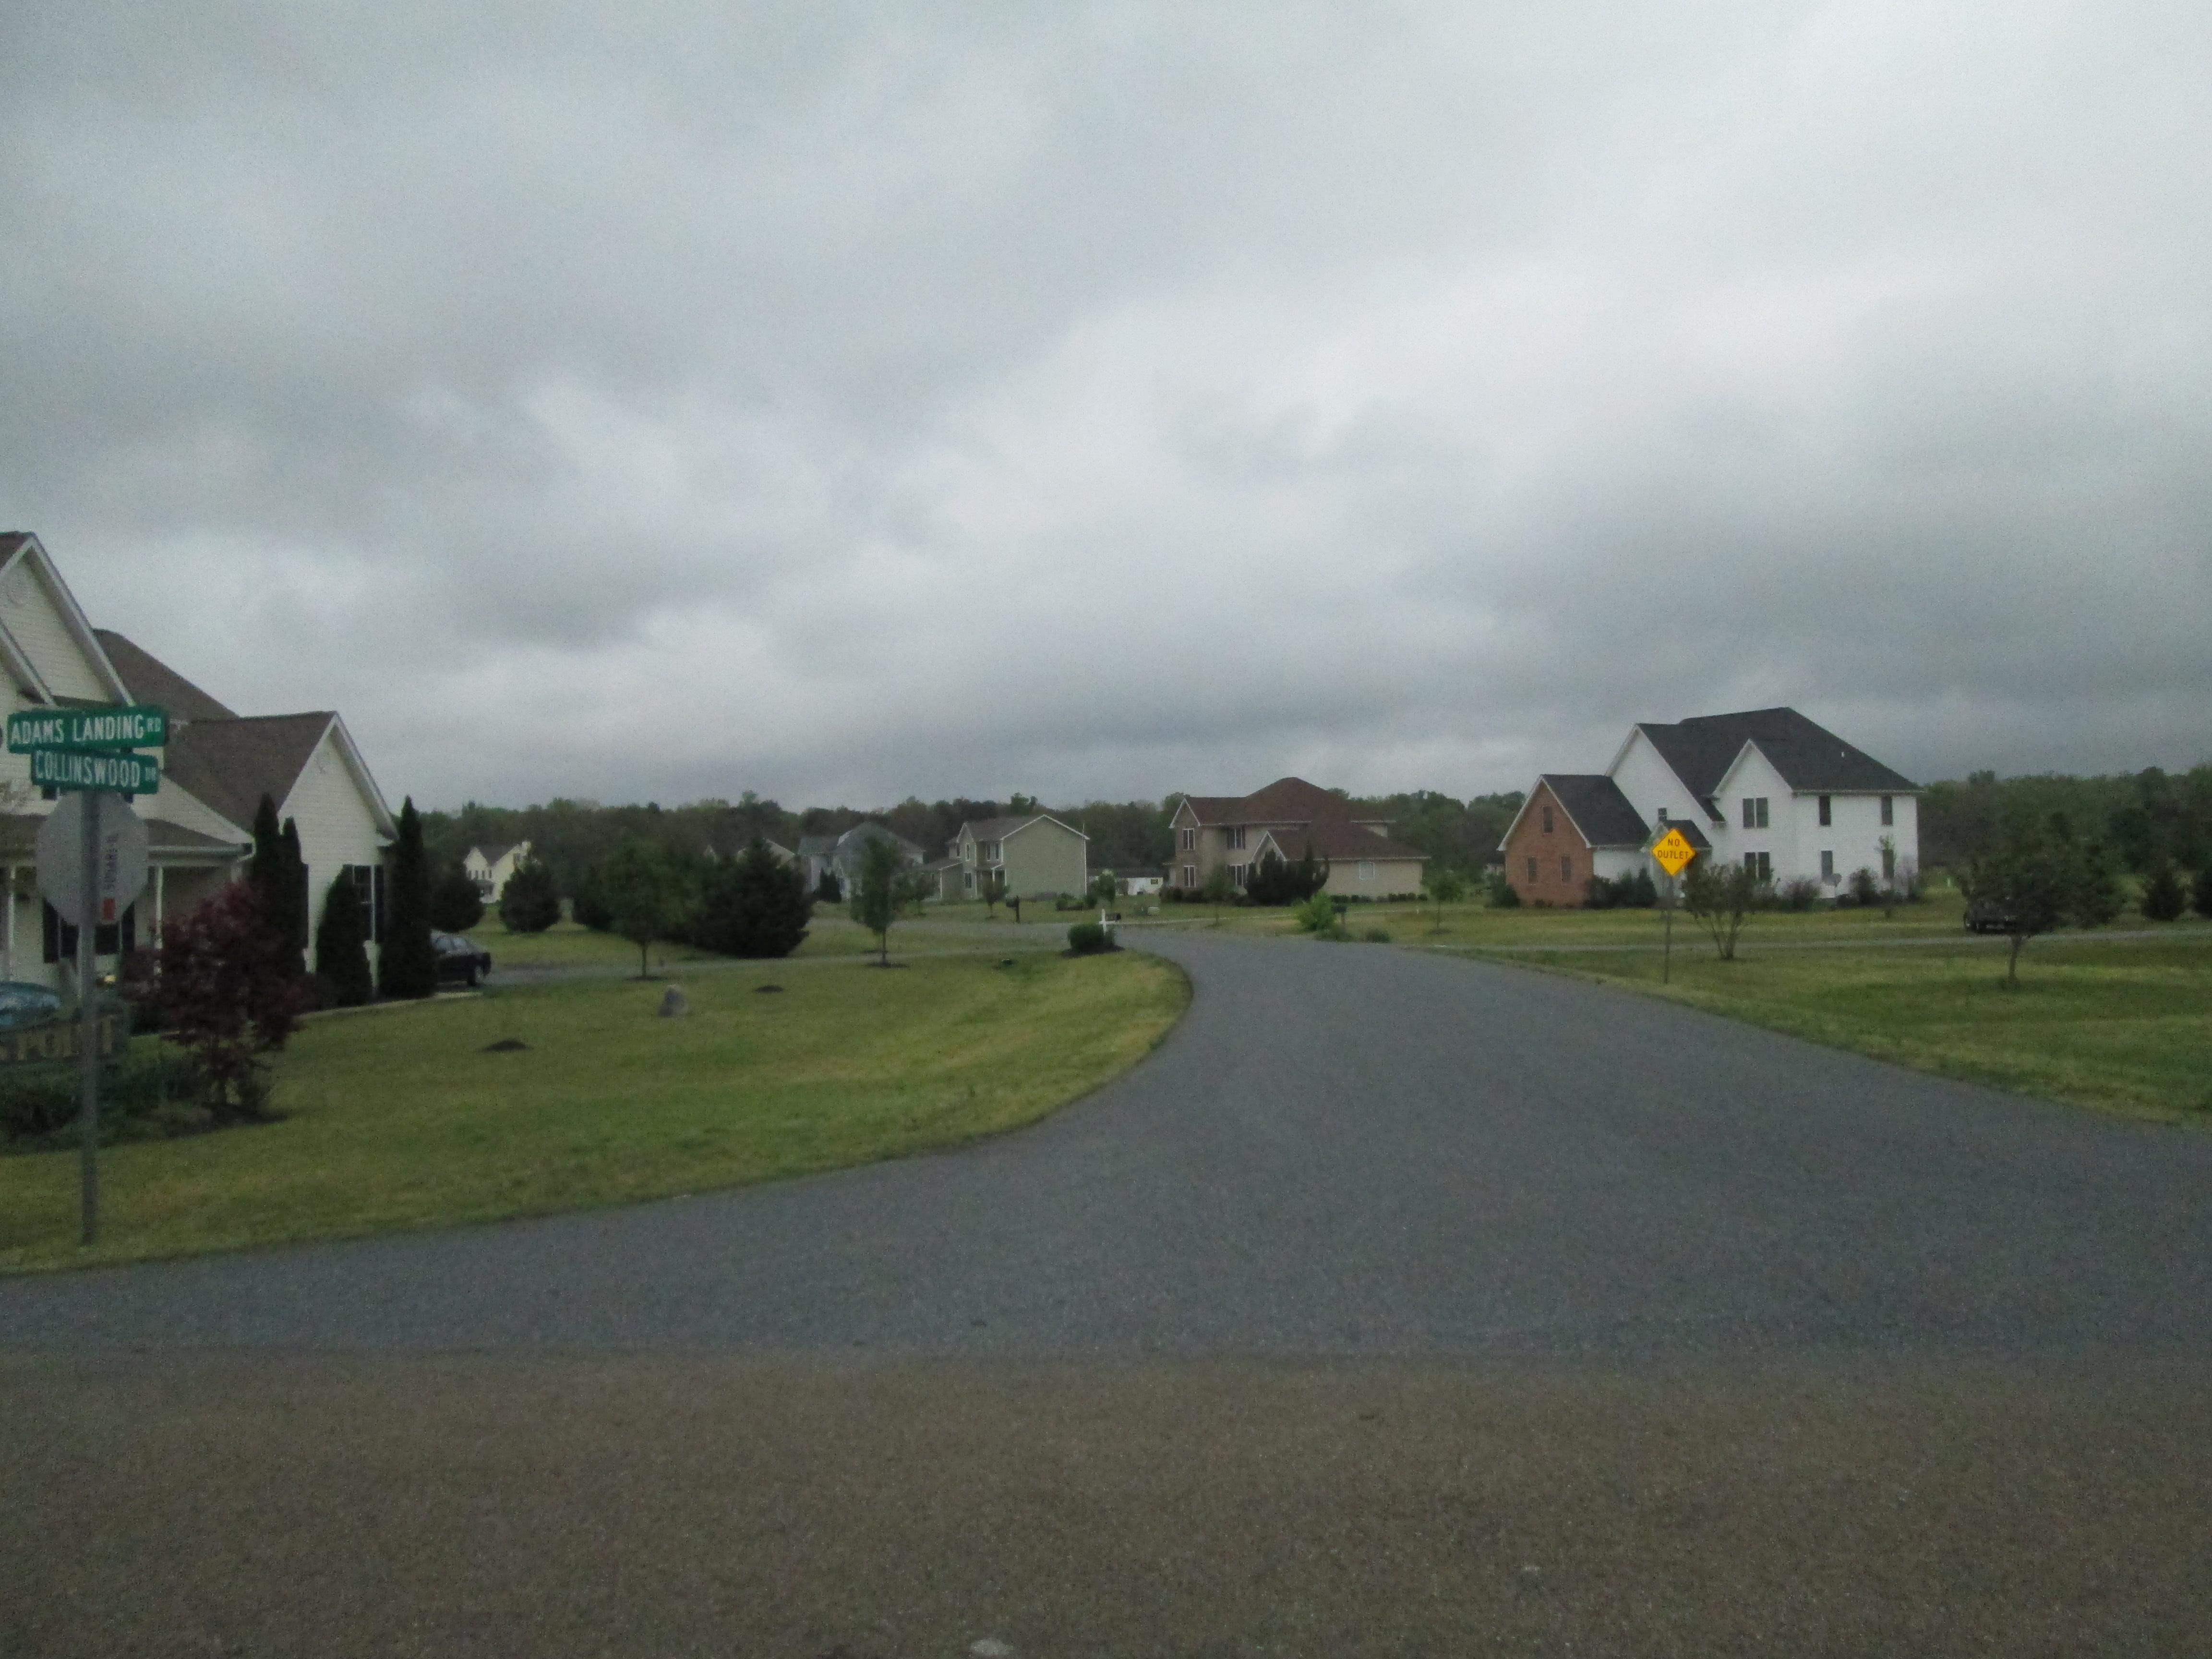 Collins Wood Drive